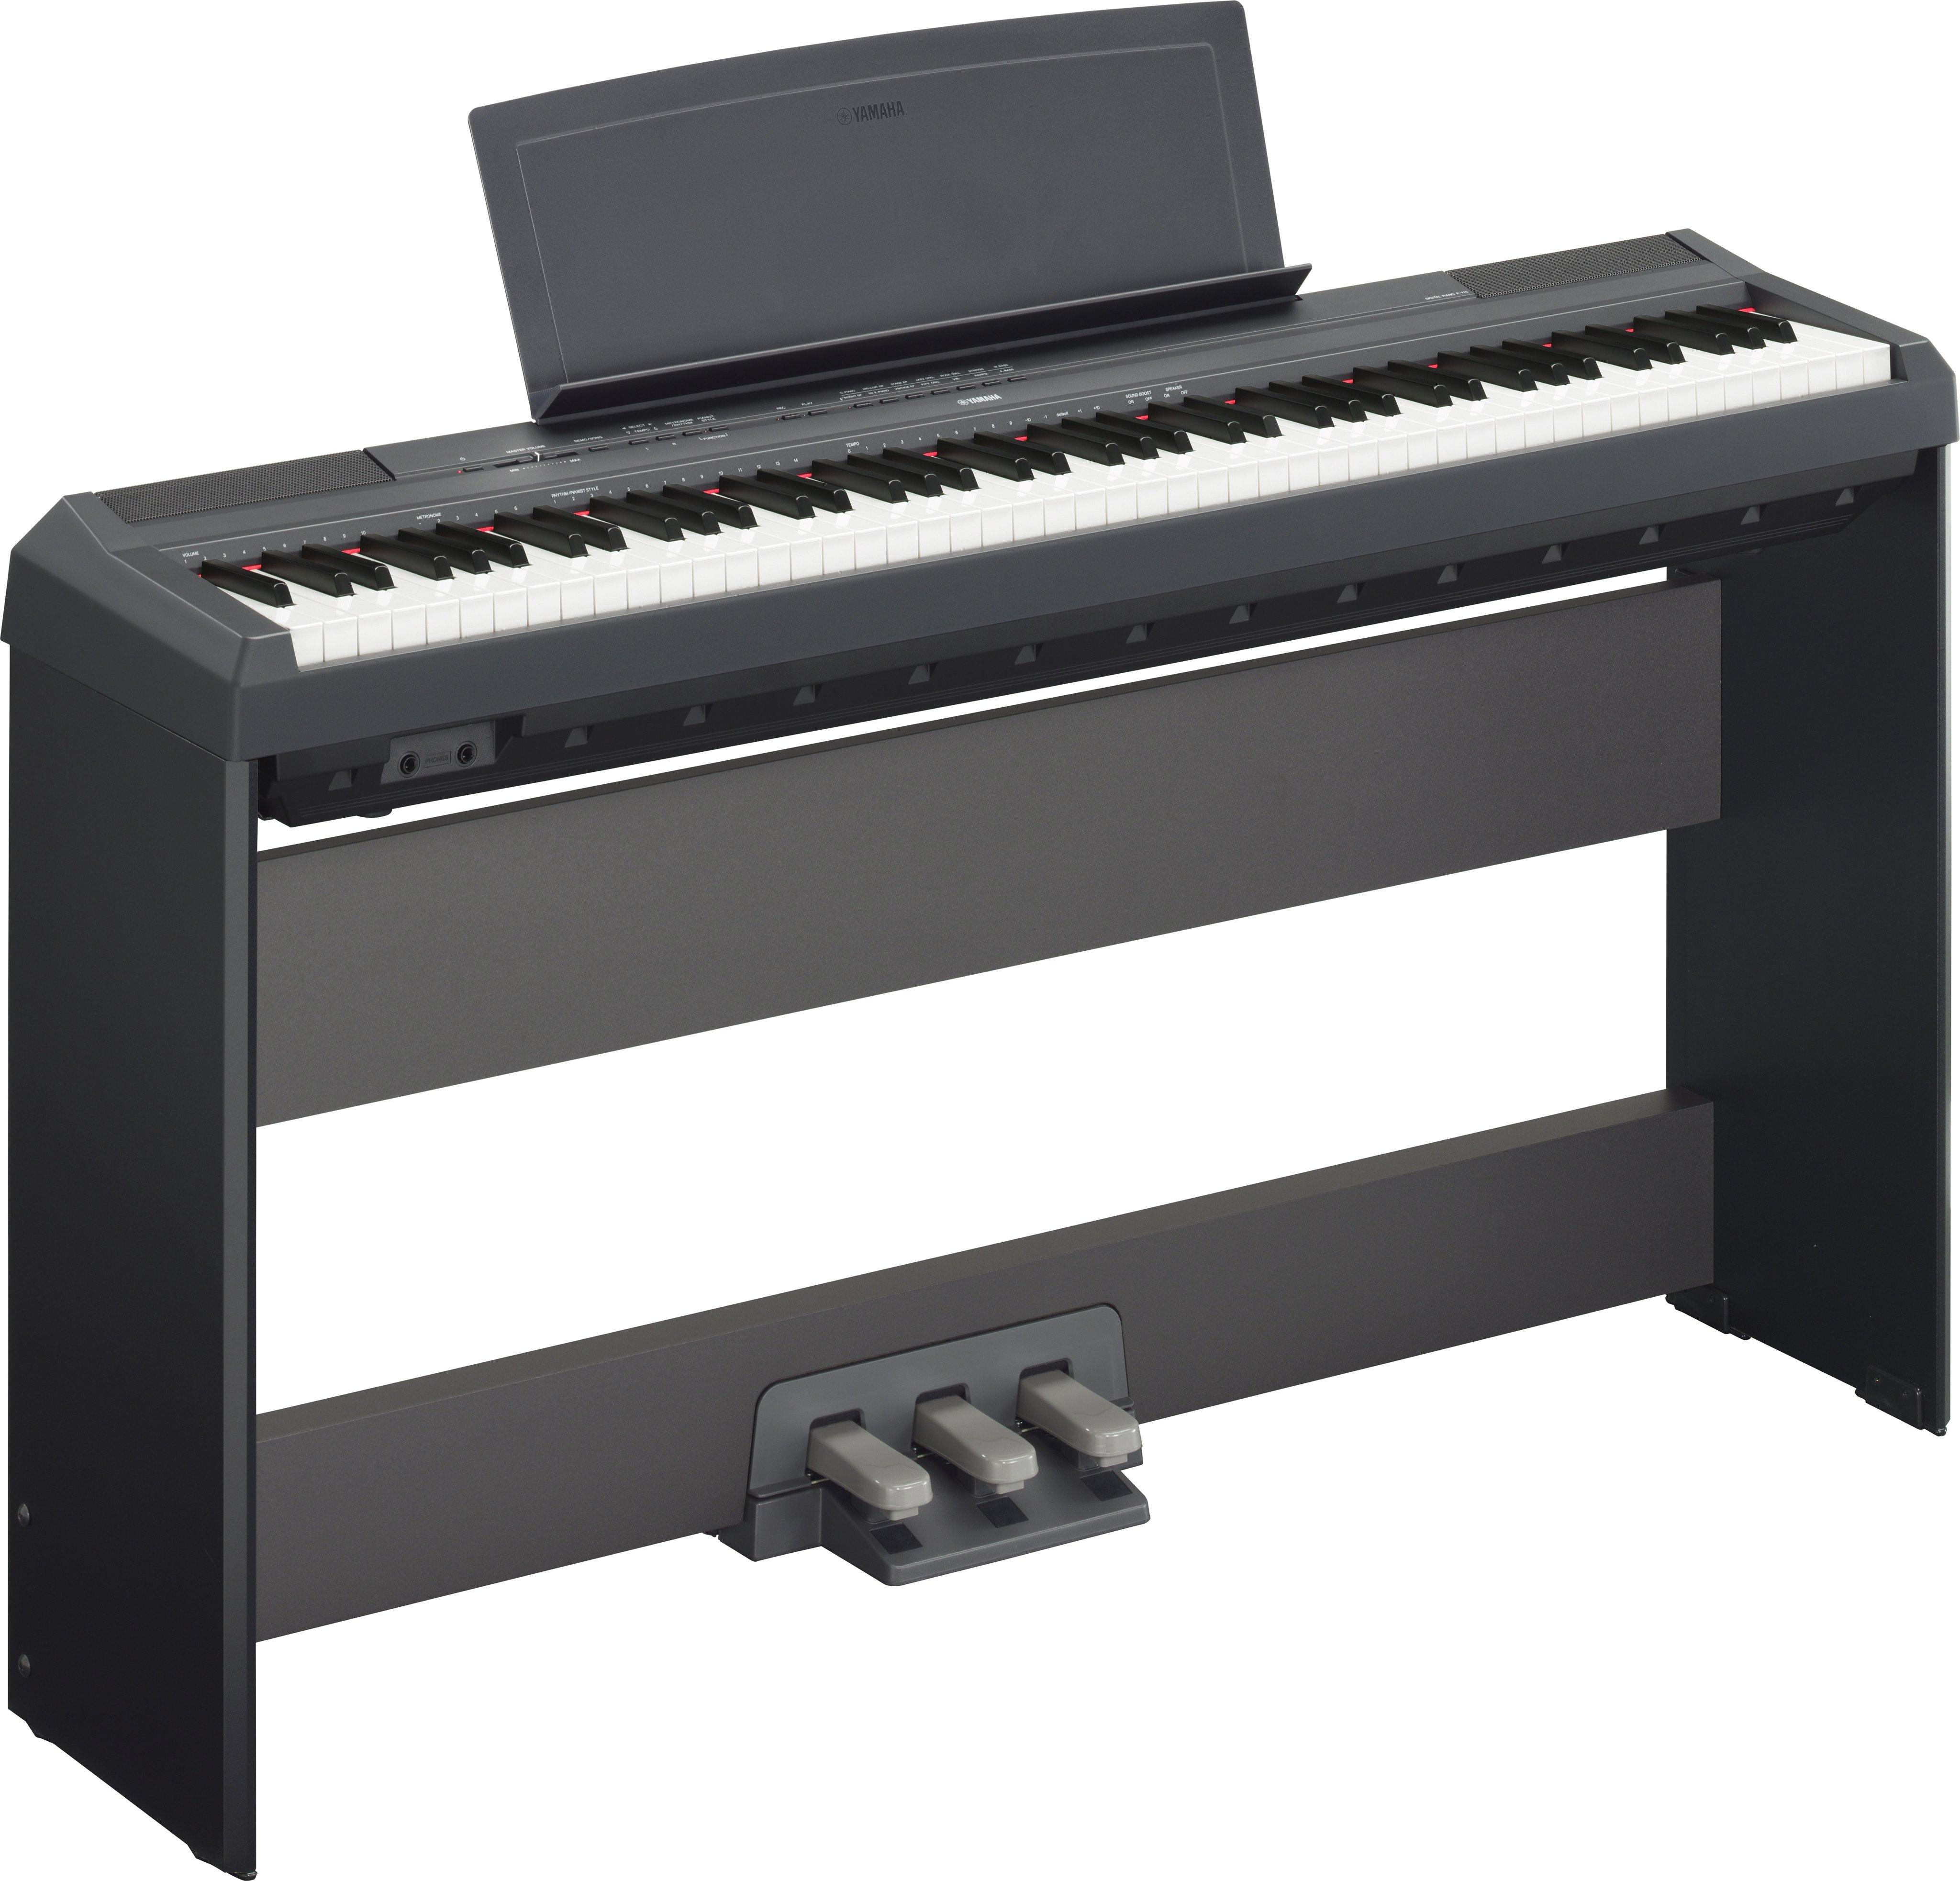 YAMAHA P-SERIES P-115 88-KEYS DIGITAL PIANO FREE BENCH & HEADPHON